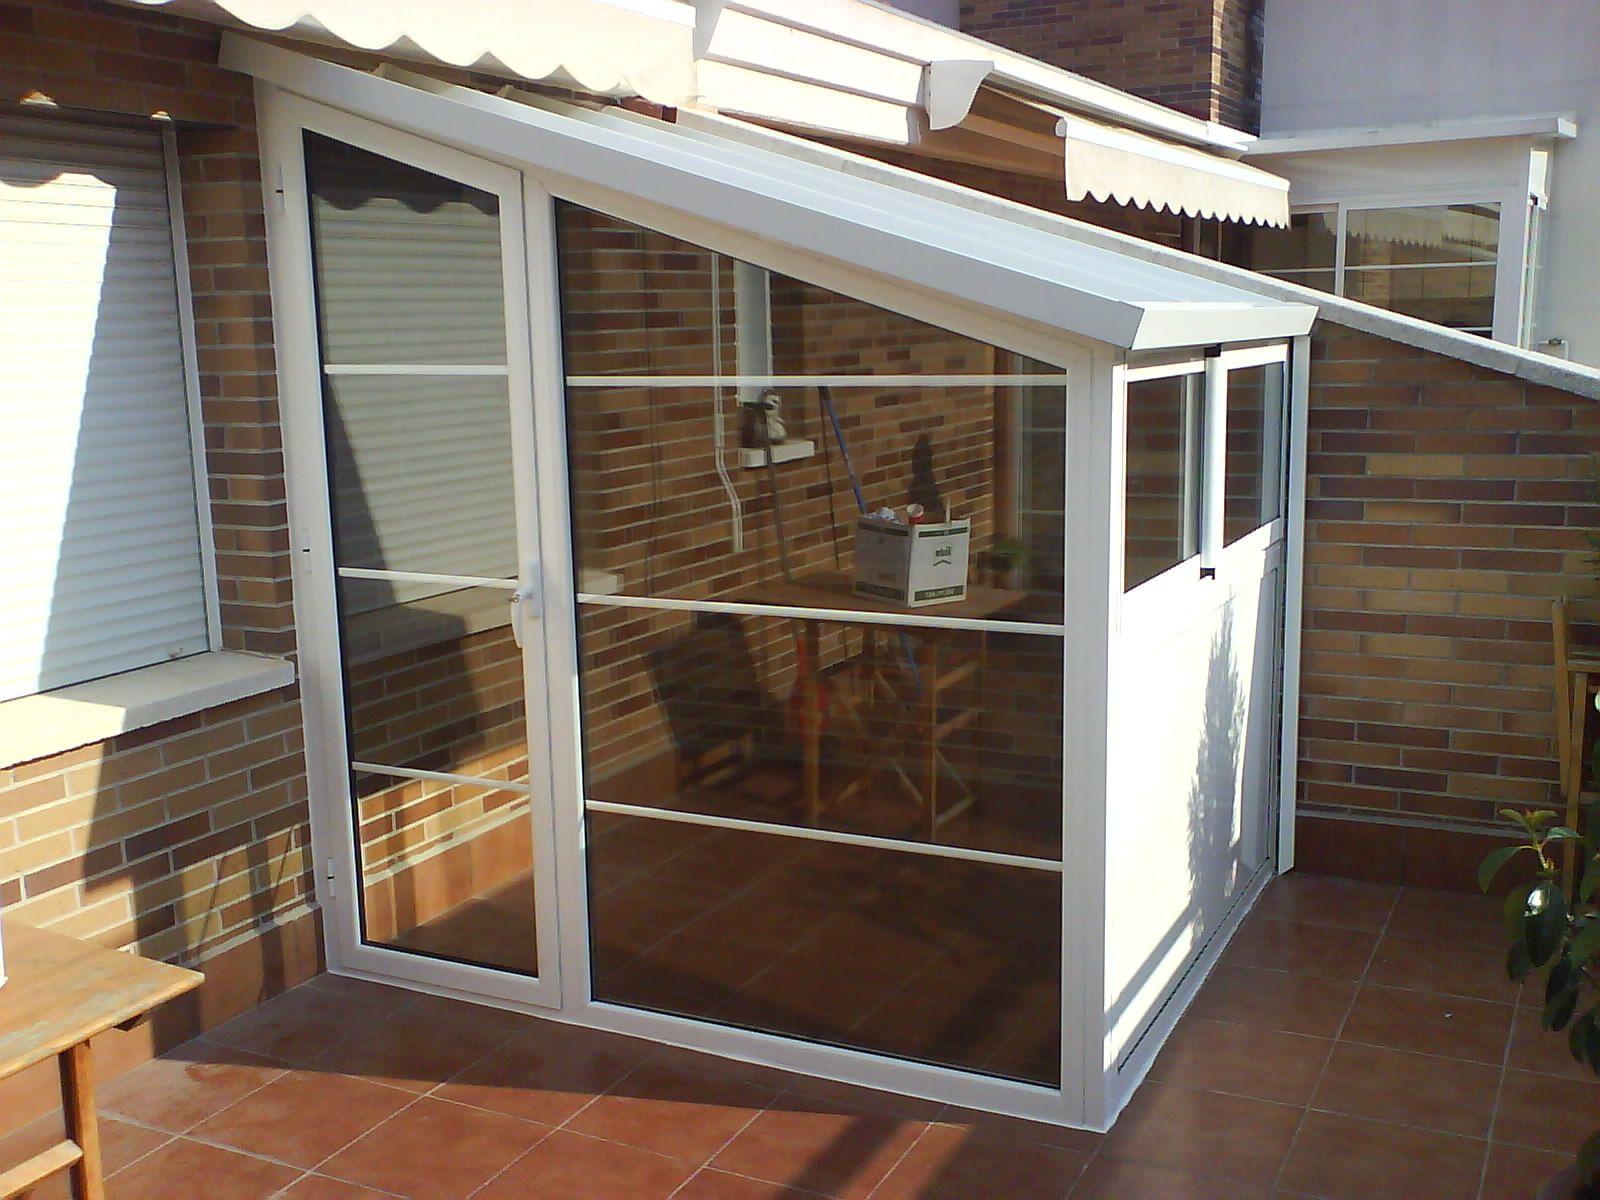 Ideas para una reforma terraza chimenea cocina antigua - Chimeneas para terrazas ...